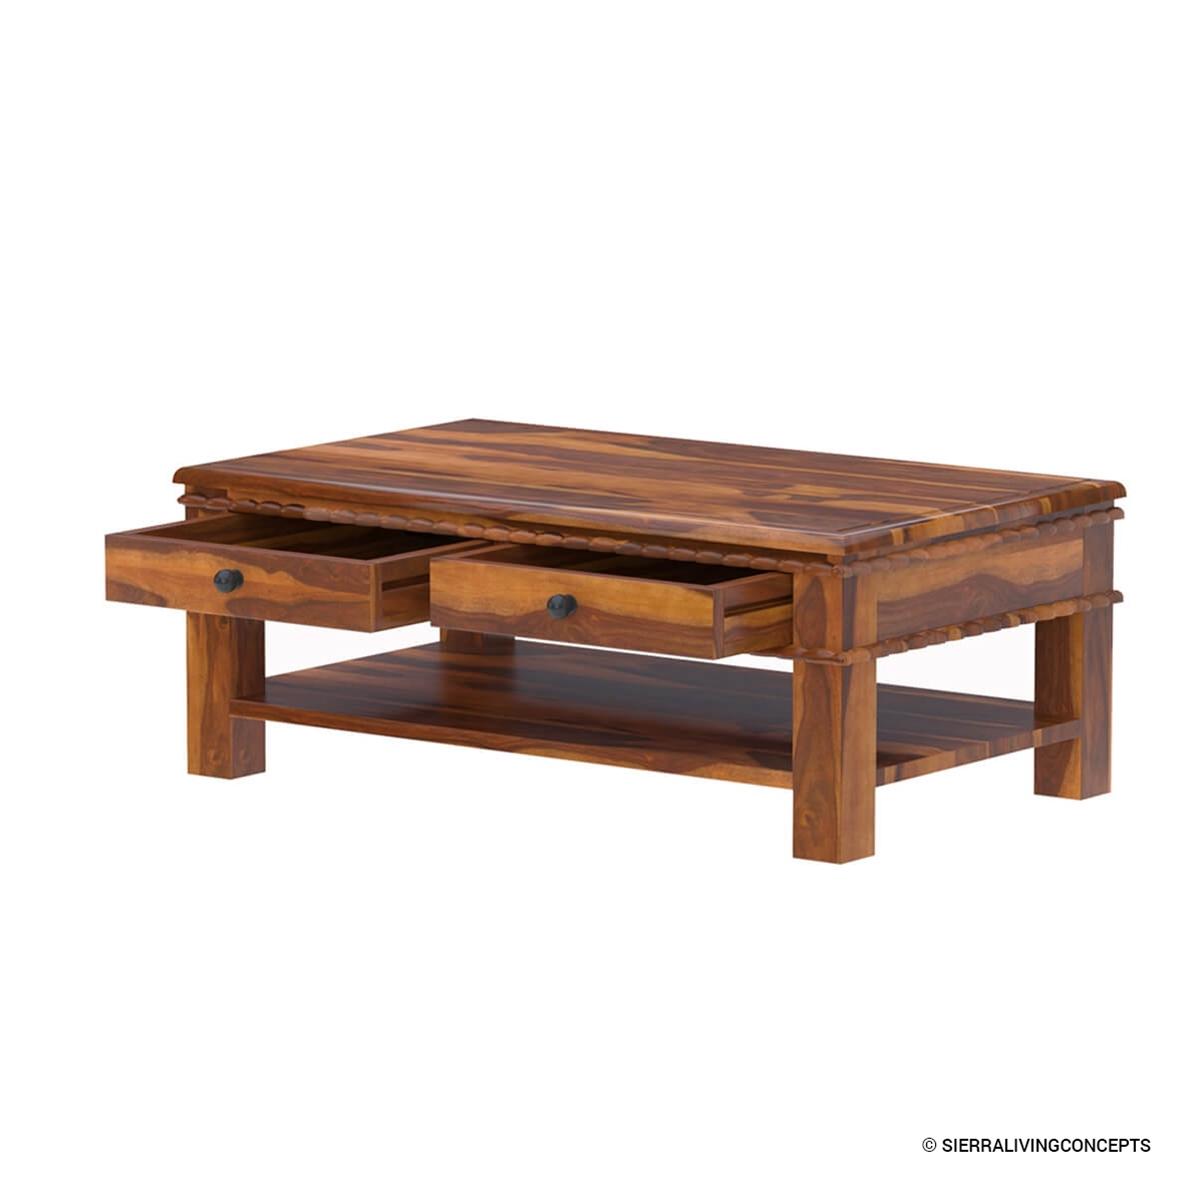 Everett Coffee Table: Everett Stylish 100% Handcrafted Solid Wood 2-Tier Coffee